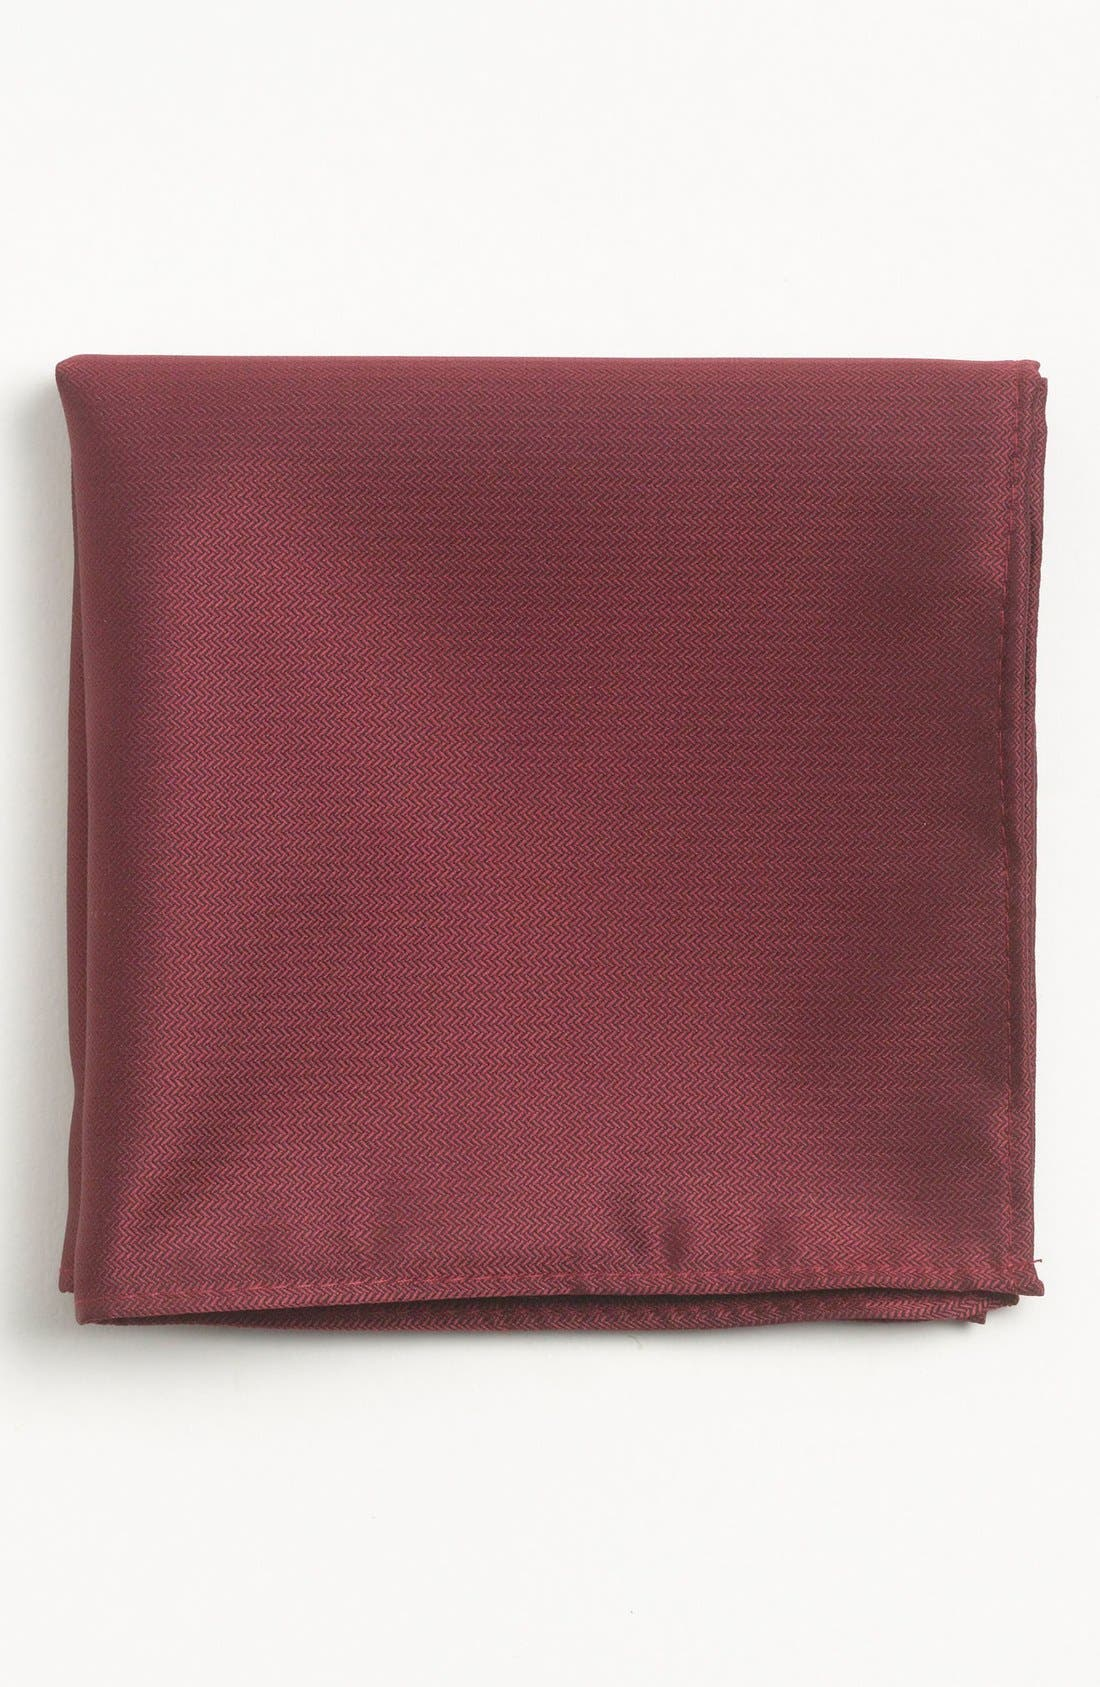 Alternate Image 1 Selected - Topman Pocket Square